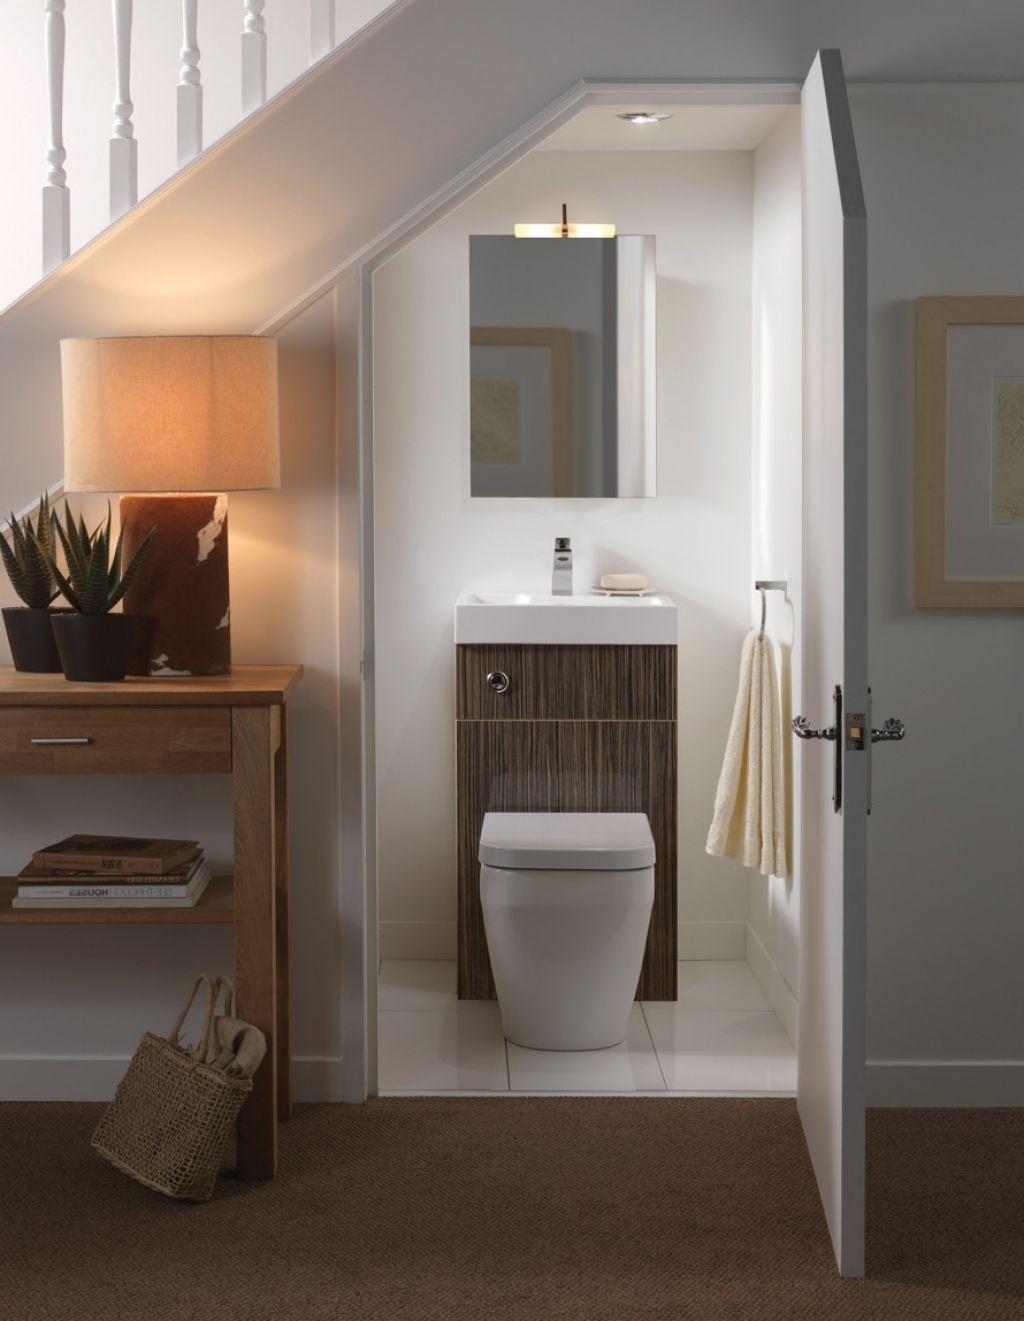 Basement Bathroom Shower Ideas Smallbasementbathroomideas Basement Bathroom Solutions Want To Try Thi Bathroom Under Stairs Room Under Stairs Bathroom Layout